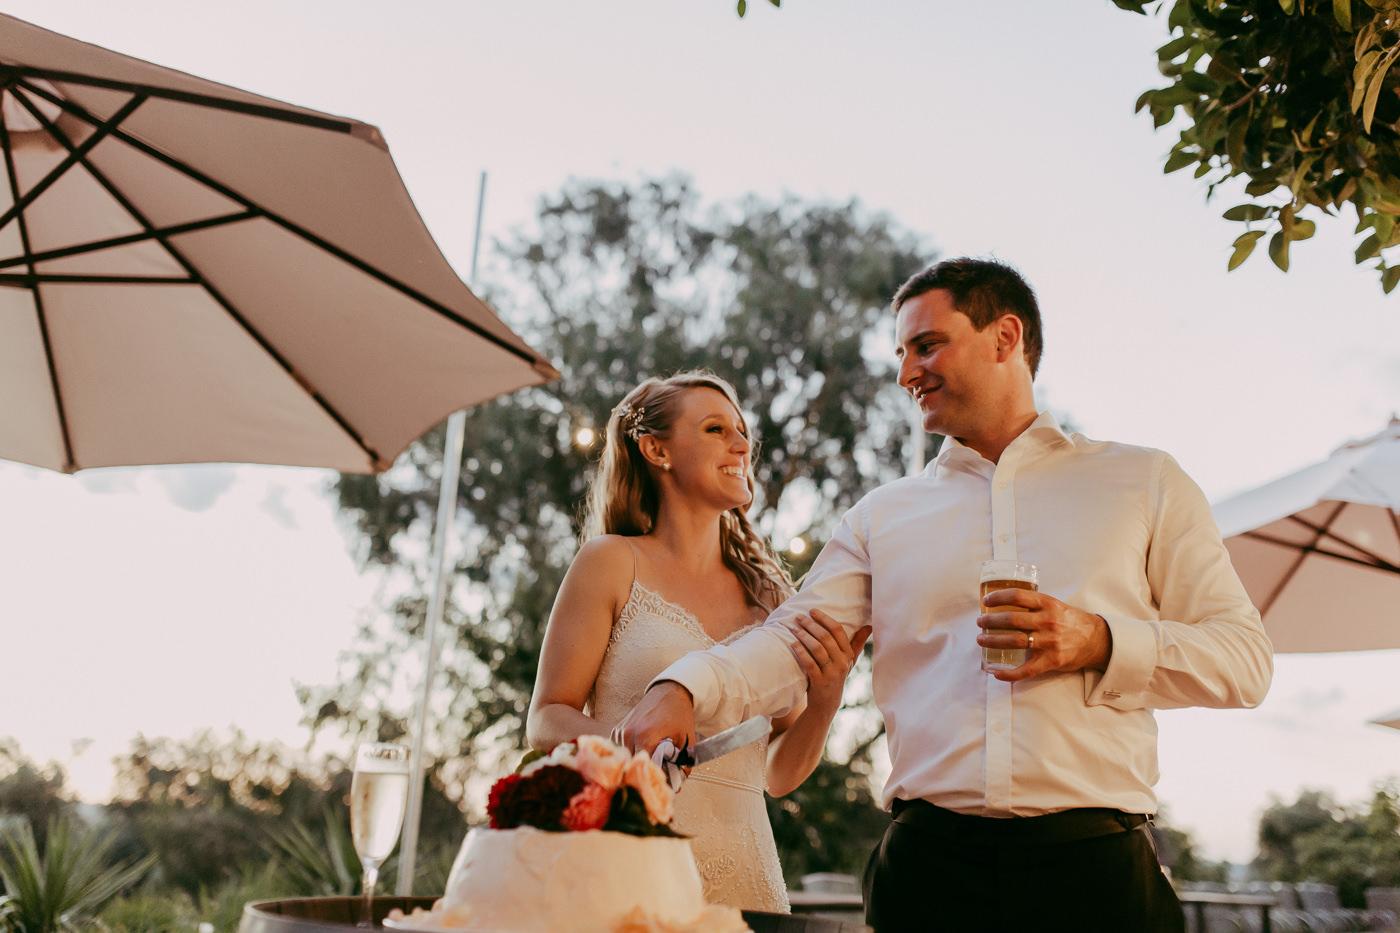 Anthony & Eliet - Wagga Wagga Wedding - Country NSW - Samantha Heather Photography-168.jpg